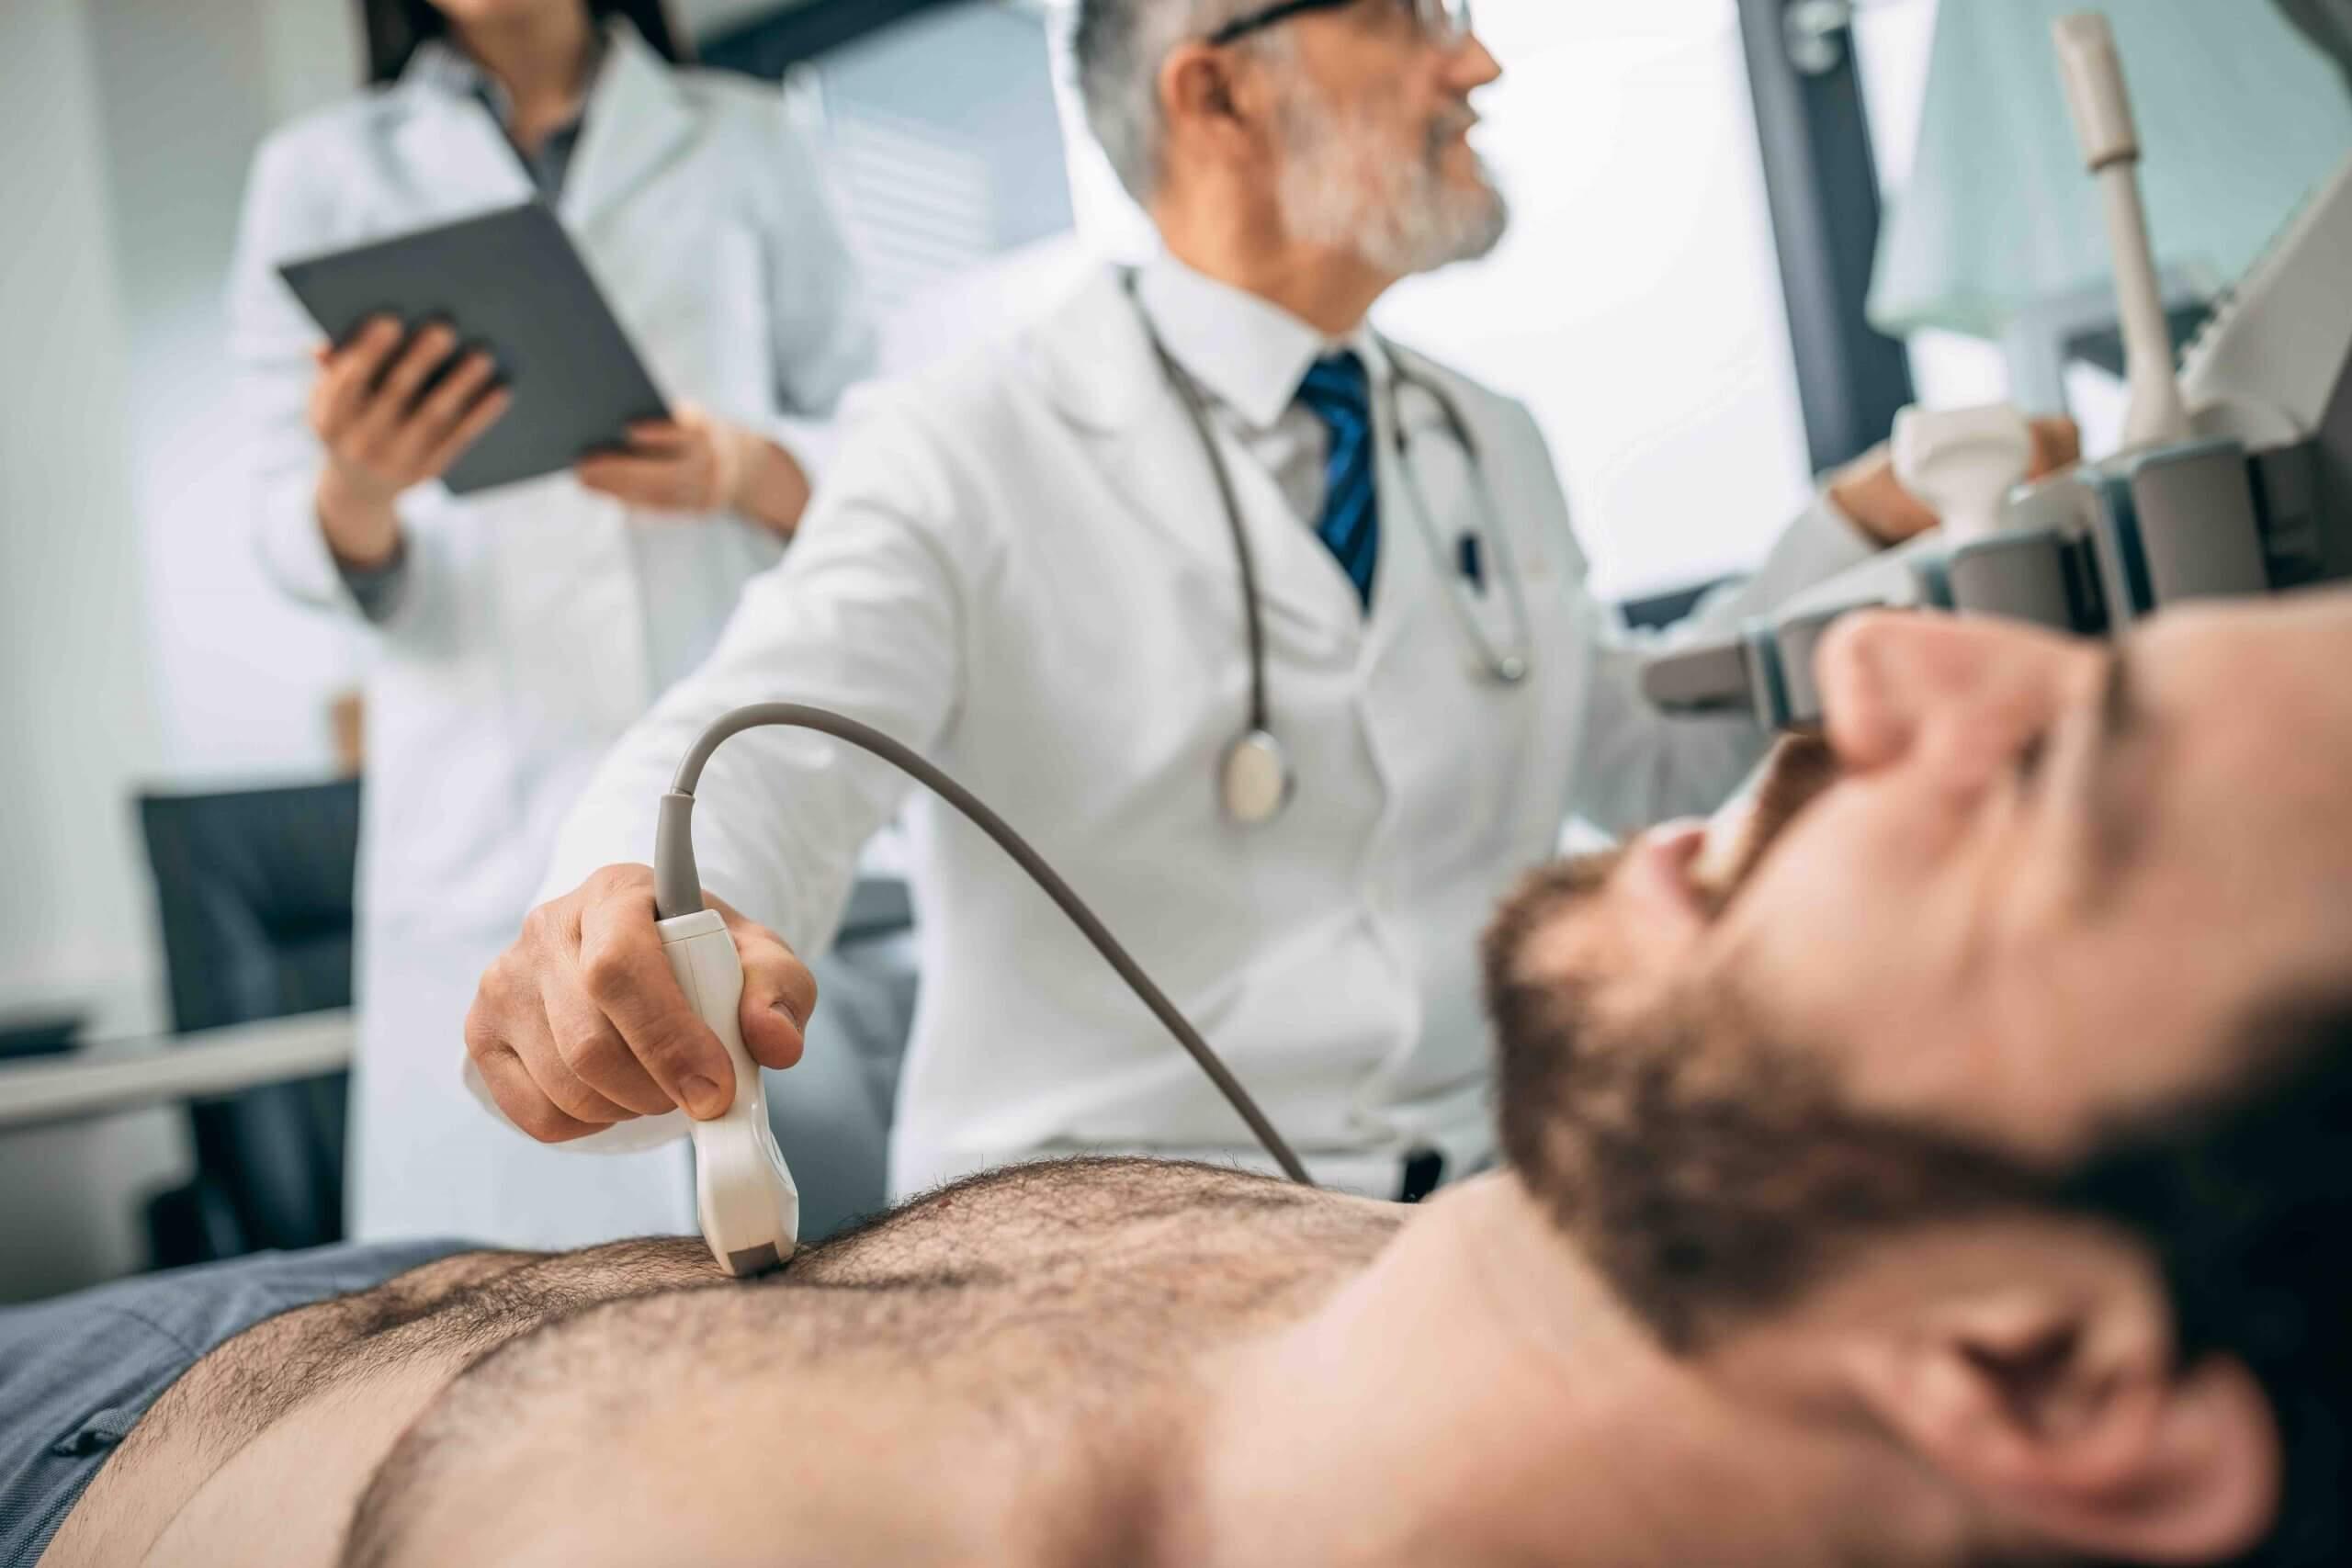 Men Breast Scan